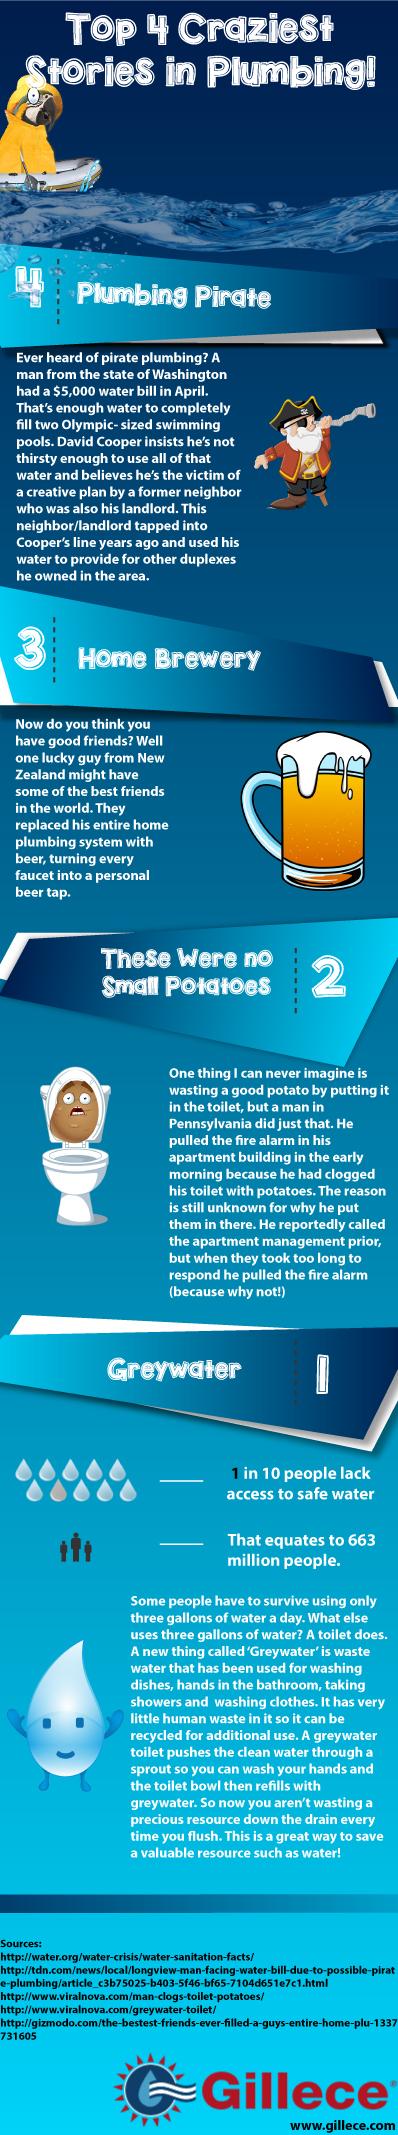 craziest-plumbing-infographic-plaza